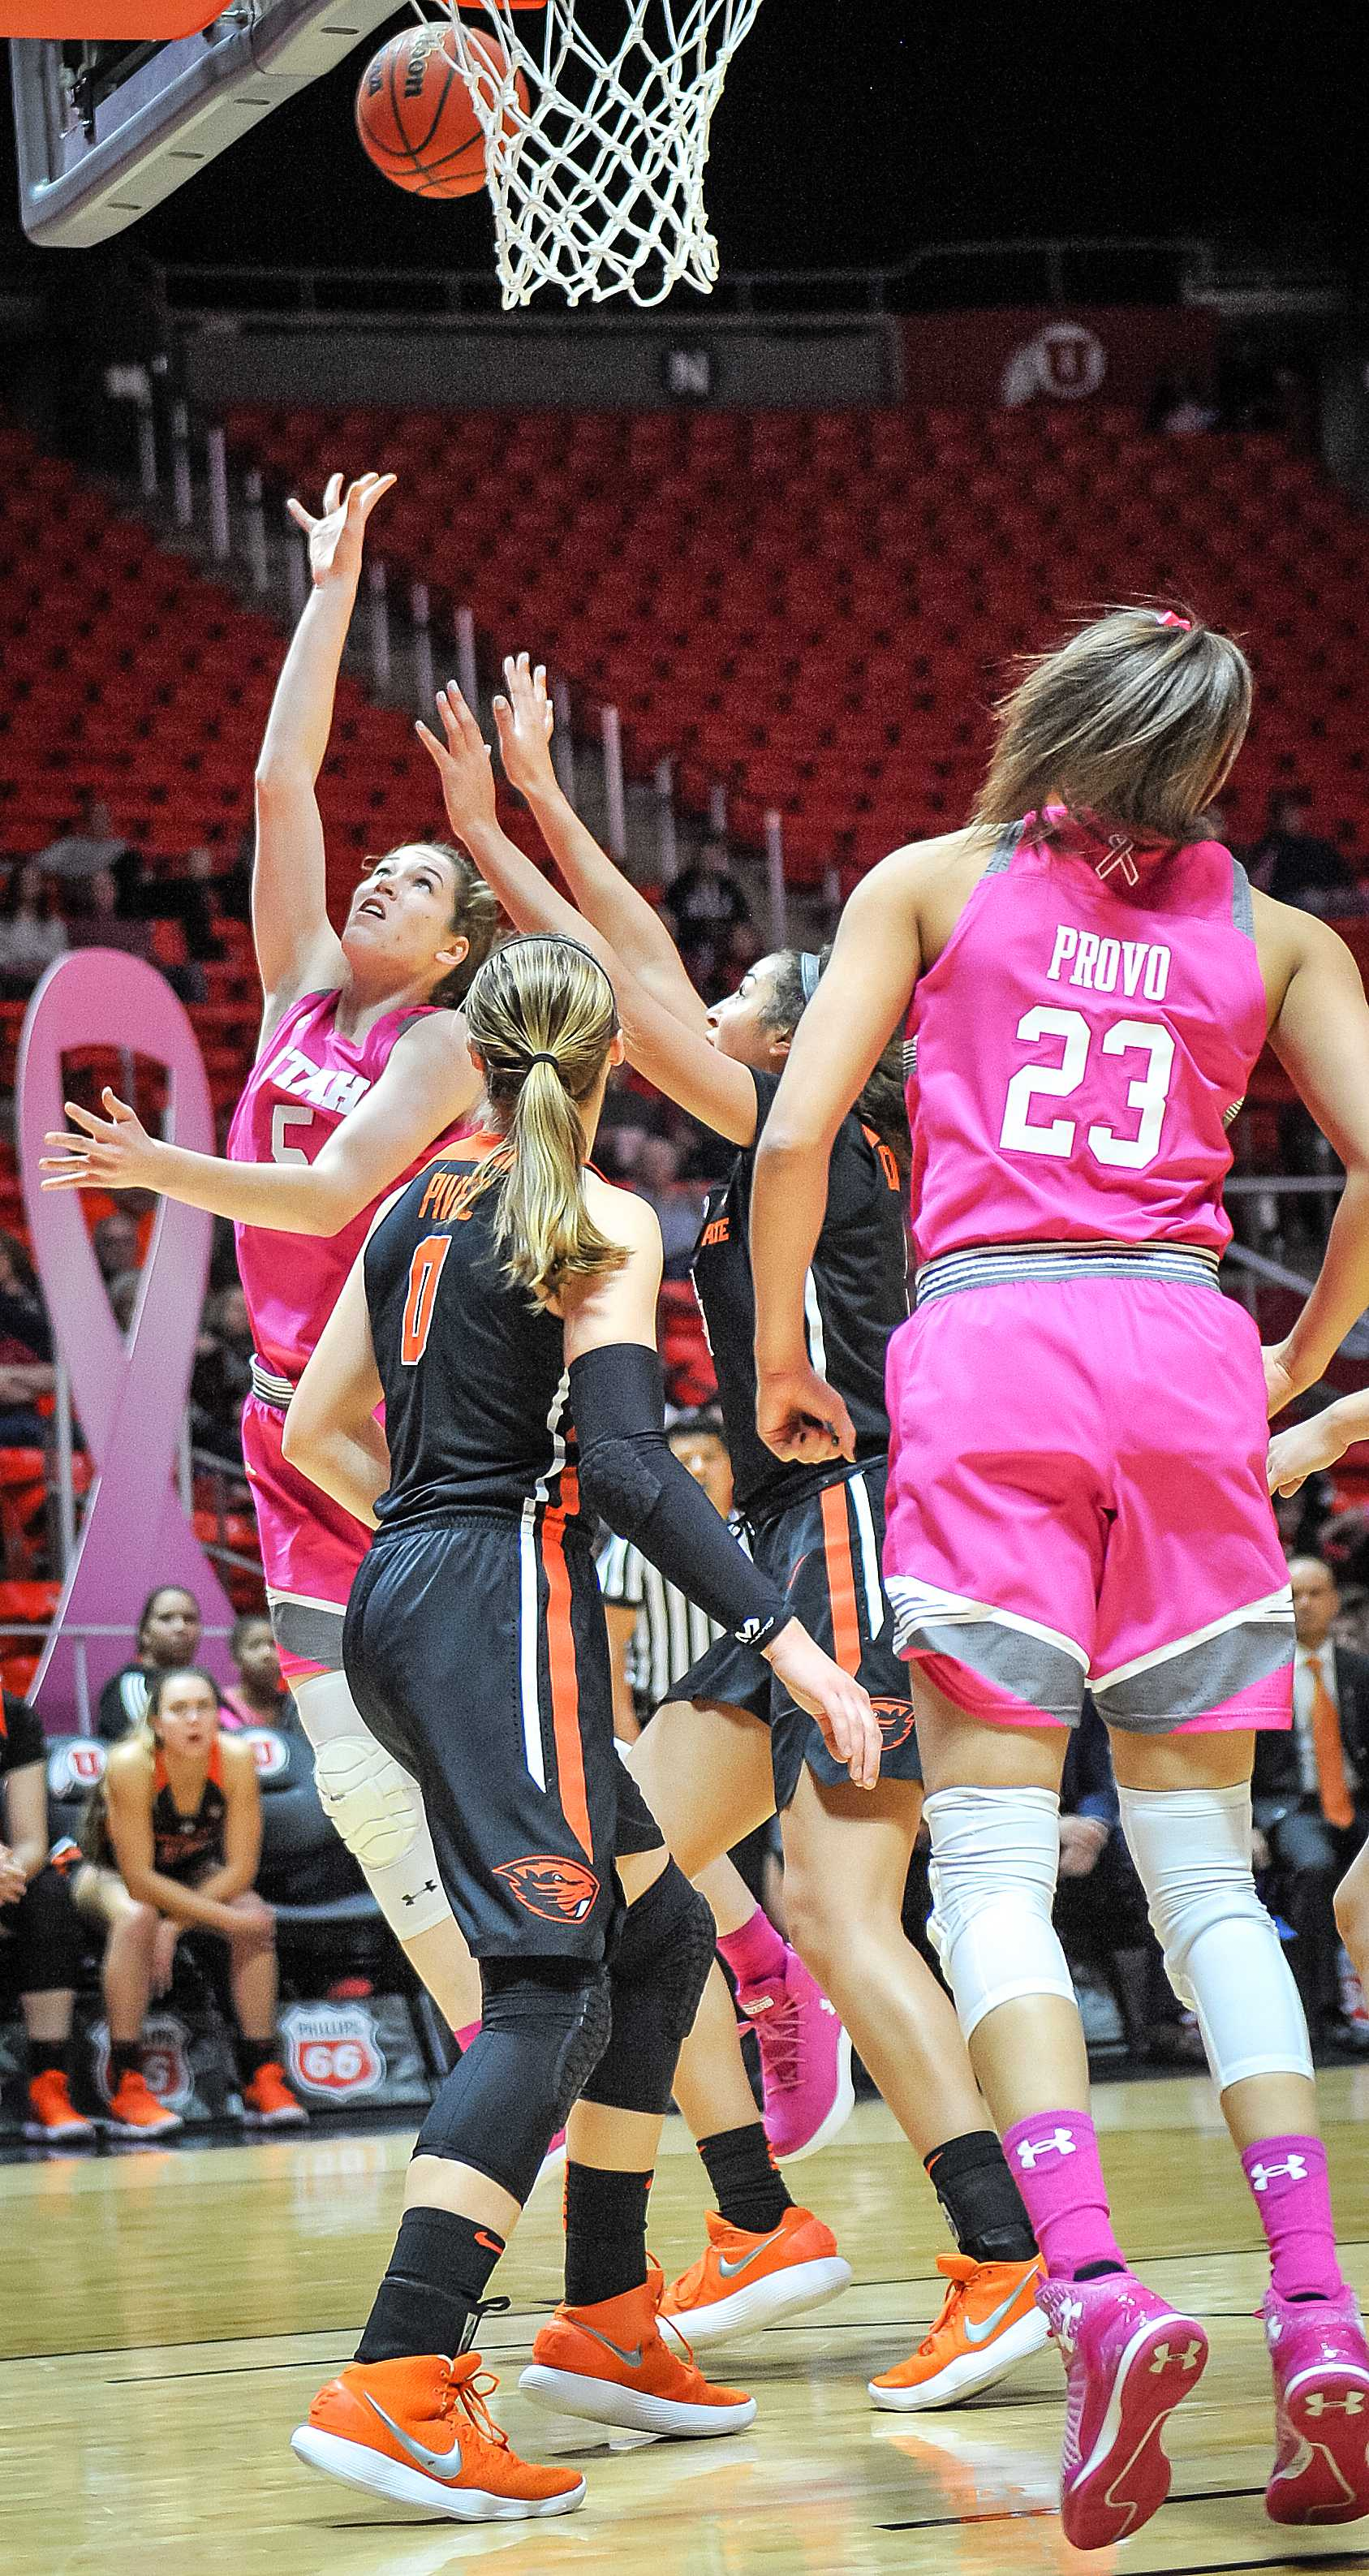 The University of Utah Lady Utes Basketball Team takes on the Oregon State University Beavers in Salt Lake City, UT on Friday, Jan. 26, 2018  (Photo by Adam Fondren | Daily Utah Chronicle)